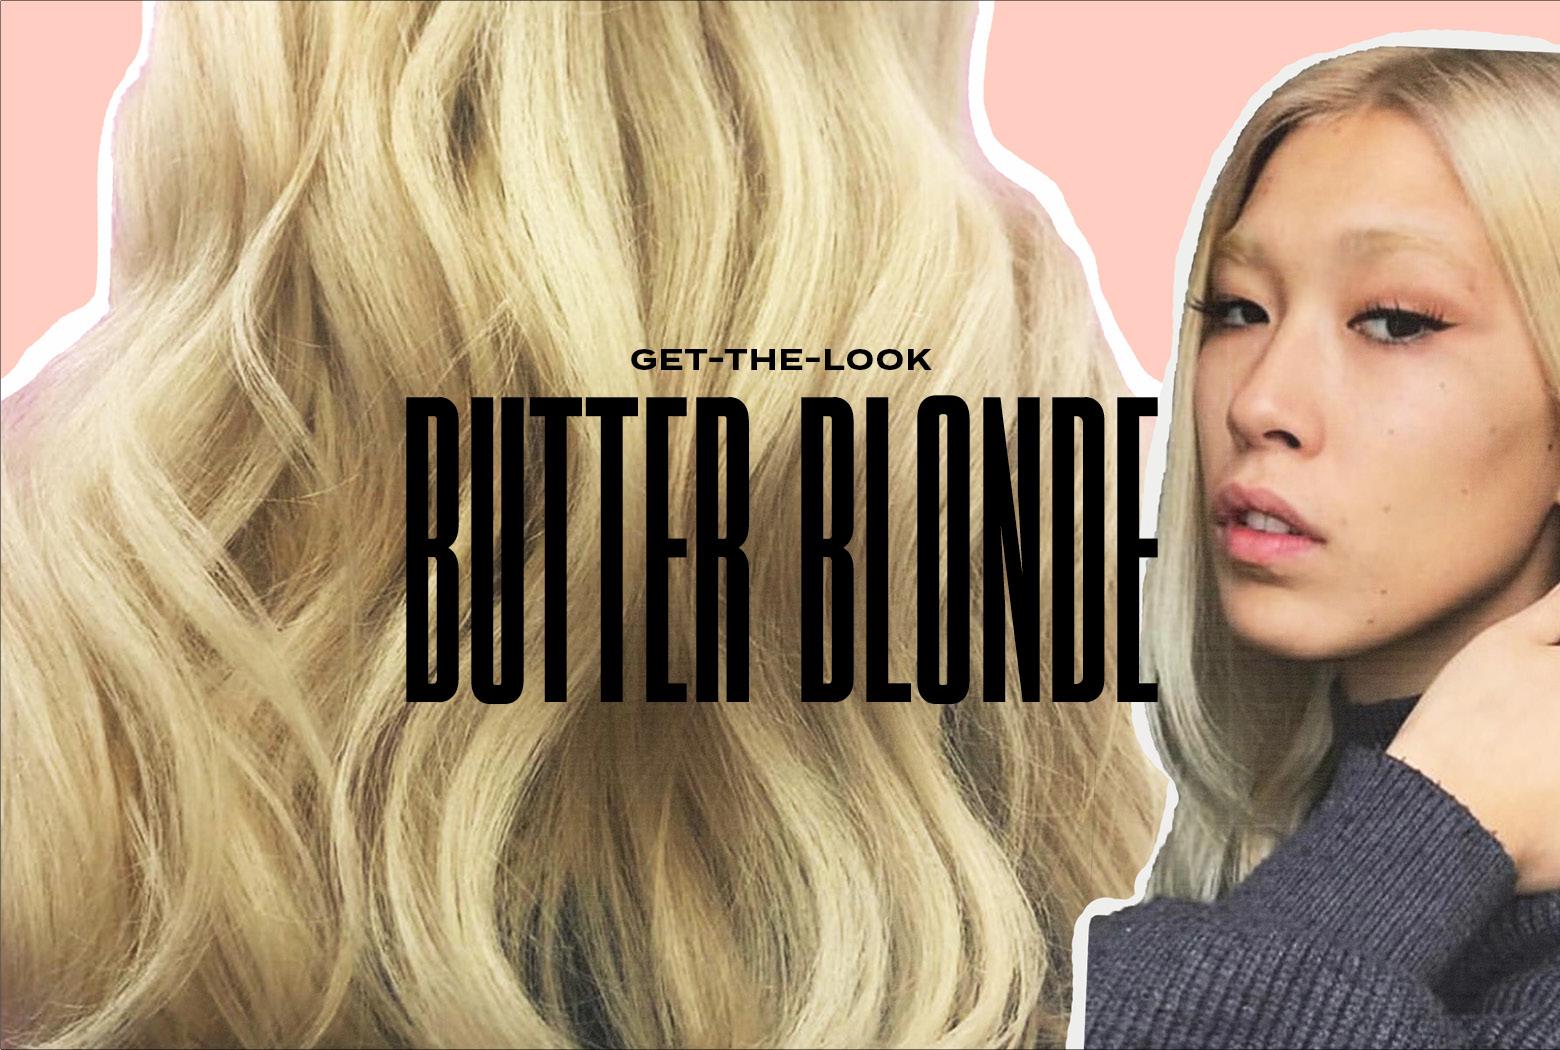 Butter Blonde image